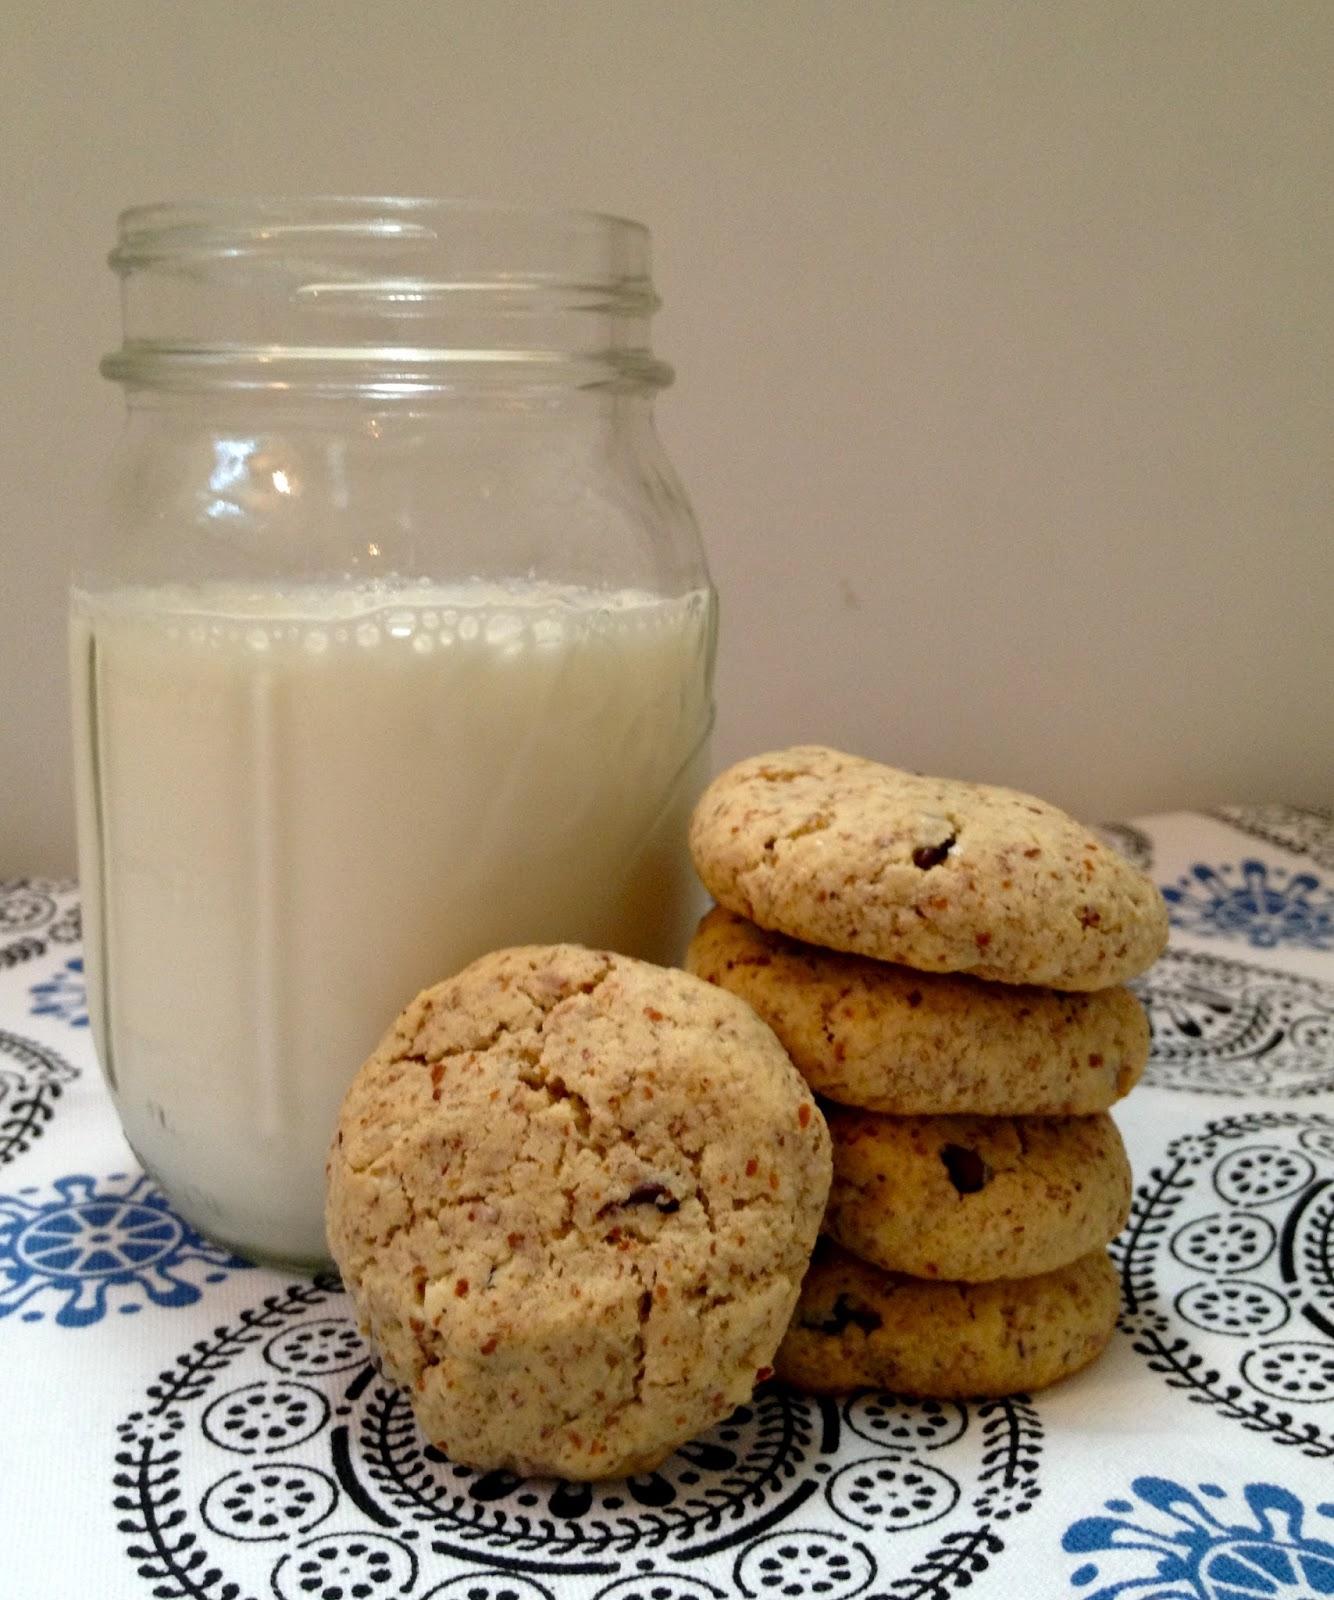 Gluten-Free Chocolate Chip Cookie | Swirl of Cinnamon